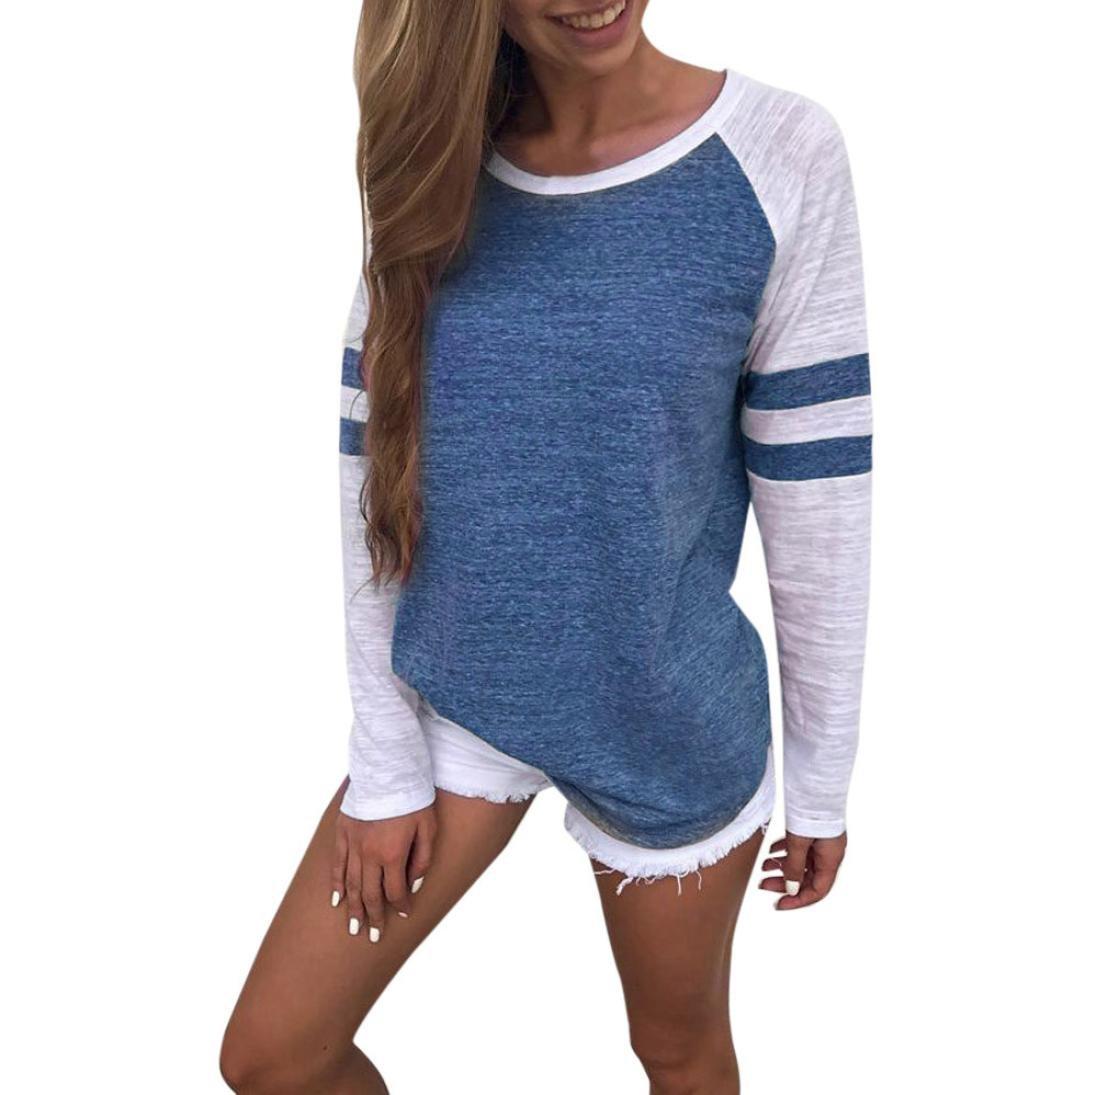 CUCUHAM Fashion Women Ladies Long Sleeve Splice Blouse Tops Clothes T Shirt (M, Blue)